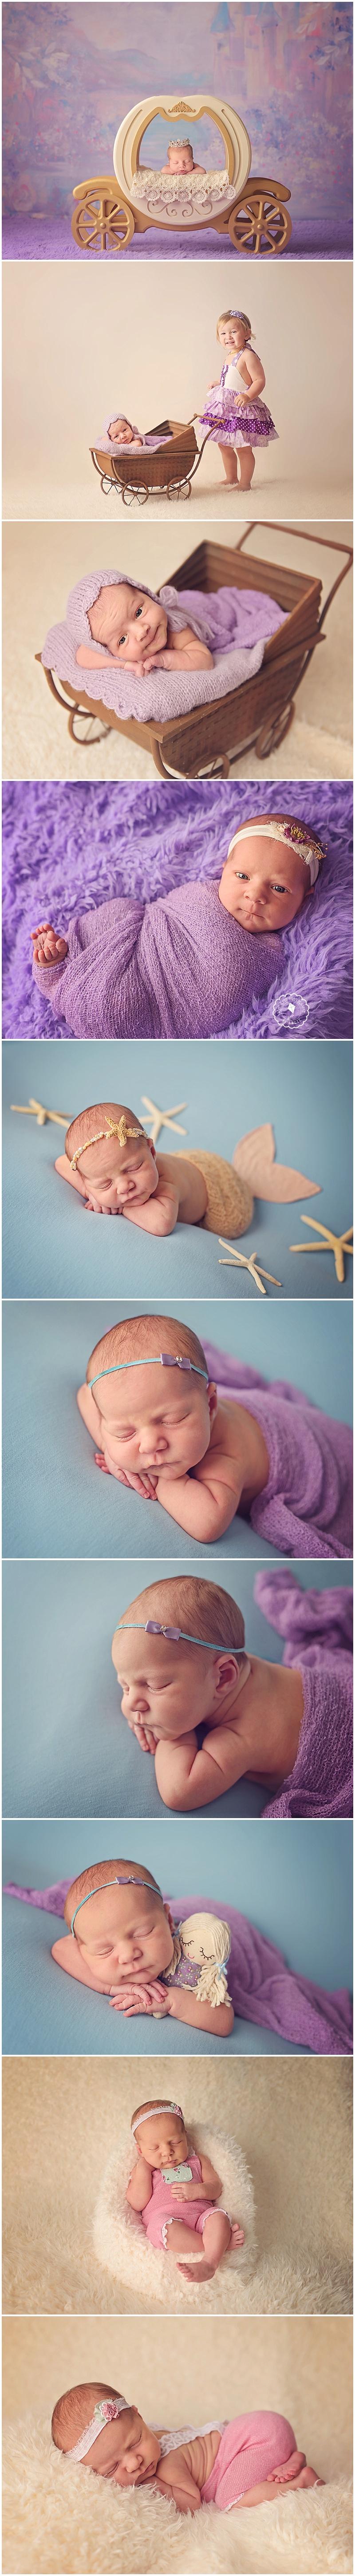 Newborn Photographer in Boca Raton, Delray, Deerfield, Parkland, Boynton, Wellington, Coral Springs, South Florida.